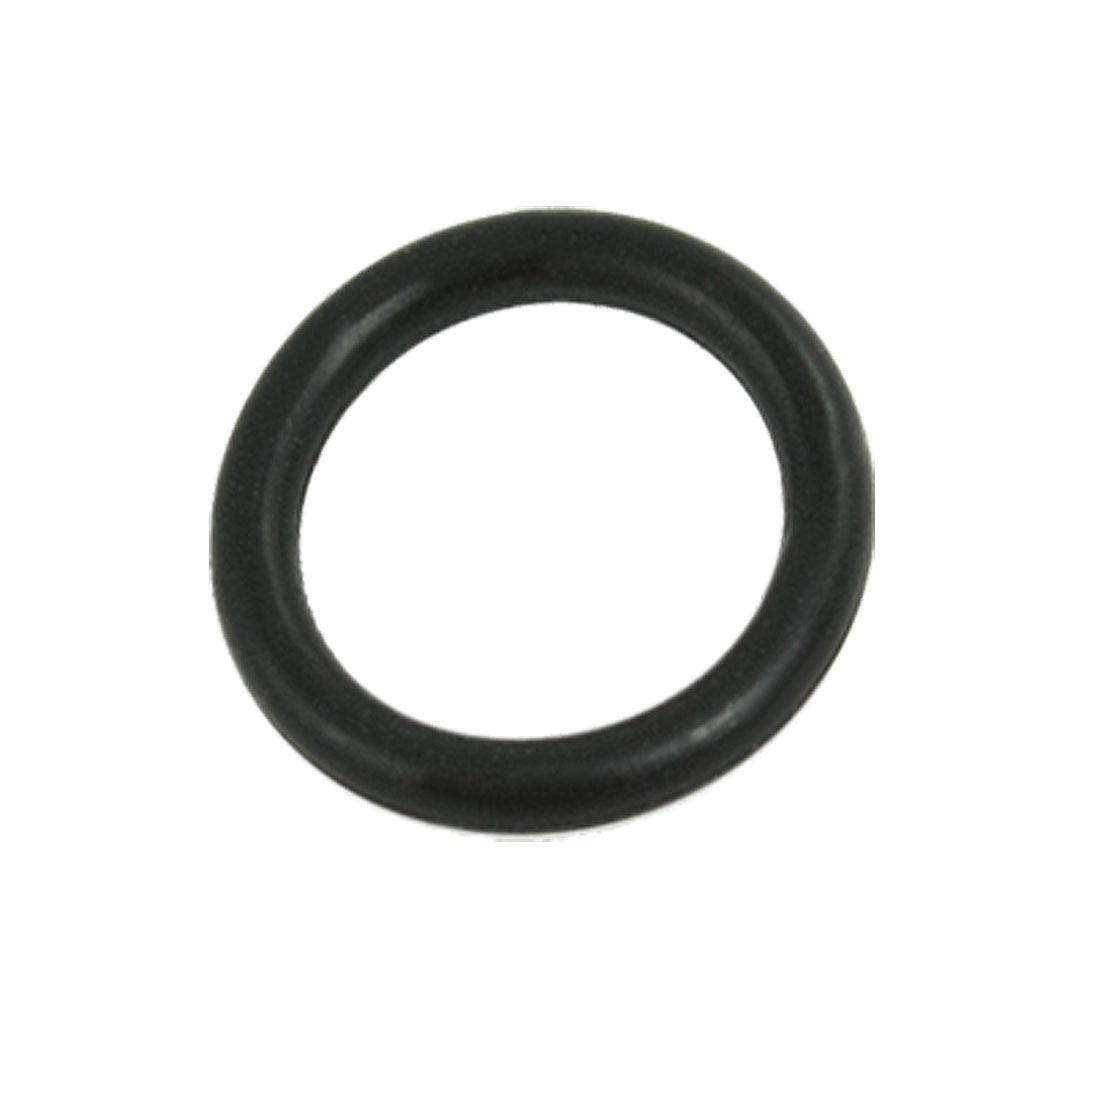 50 Pcs 45mm x 39mm x 3.5mm Mechanical Fluorine Rubber O Ring Oil Sealing Washers